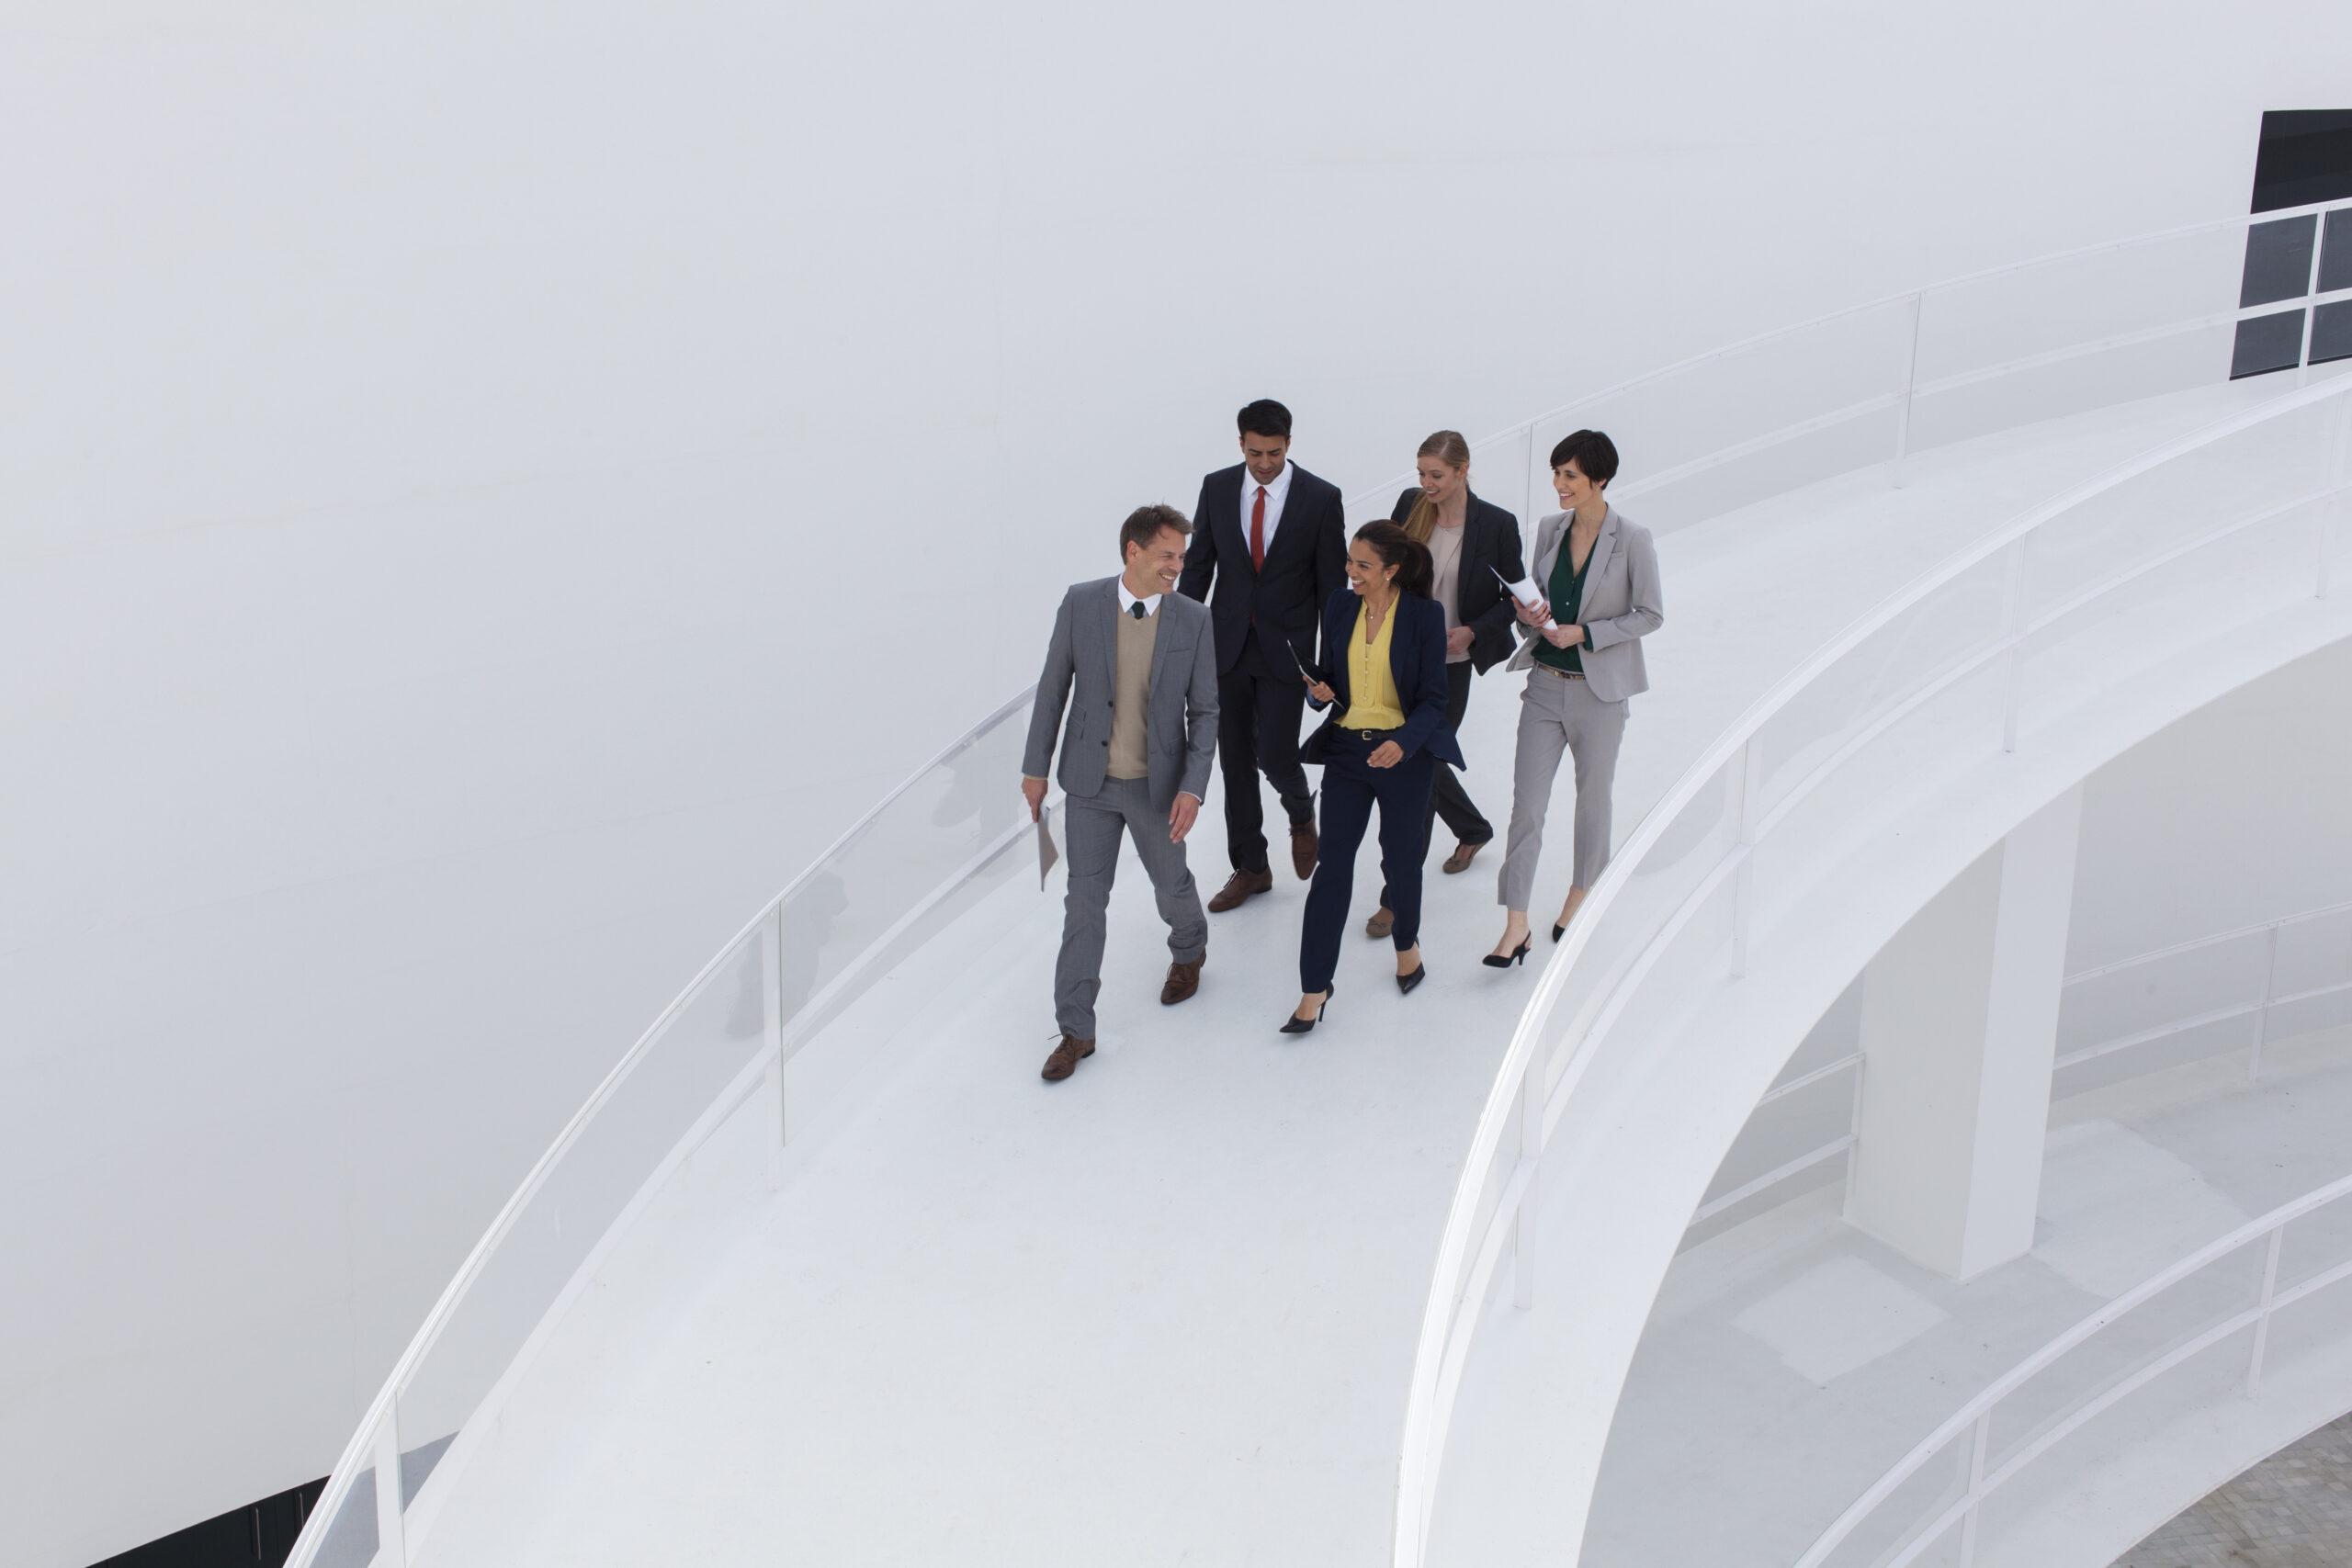 Corporate business people walking on modern ramp